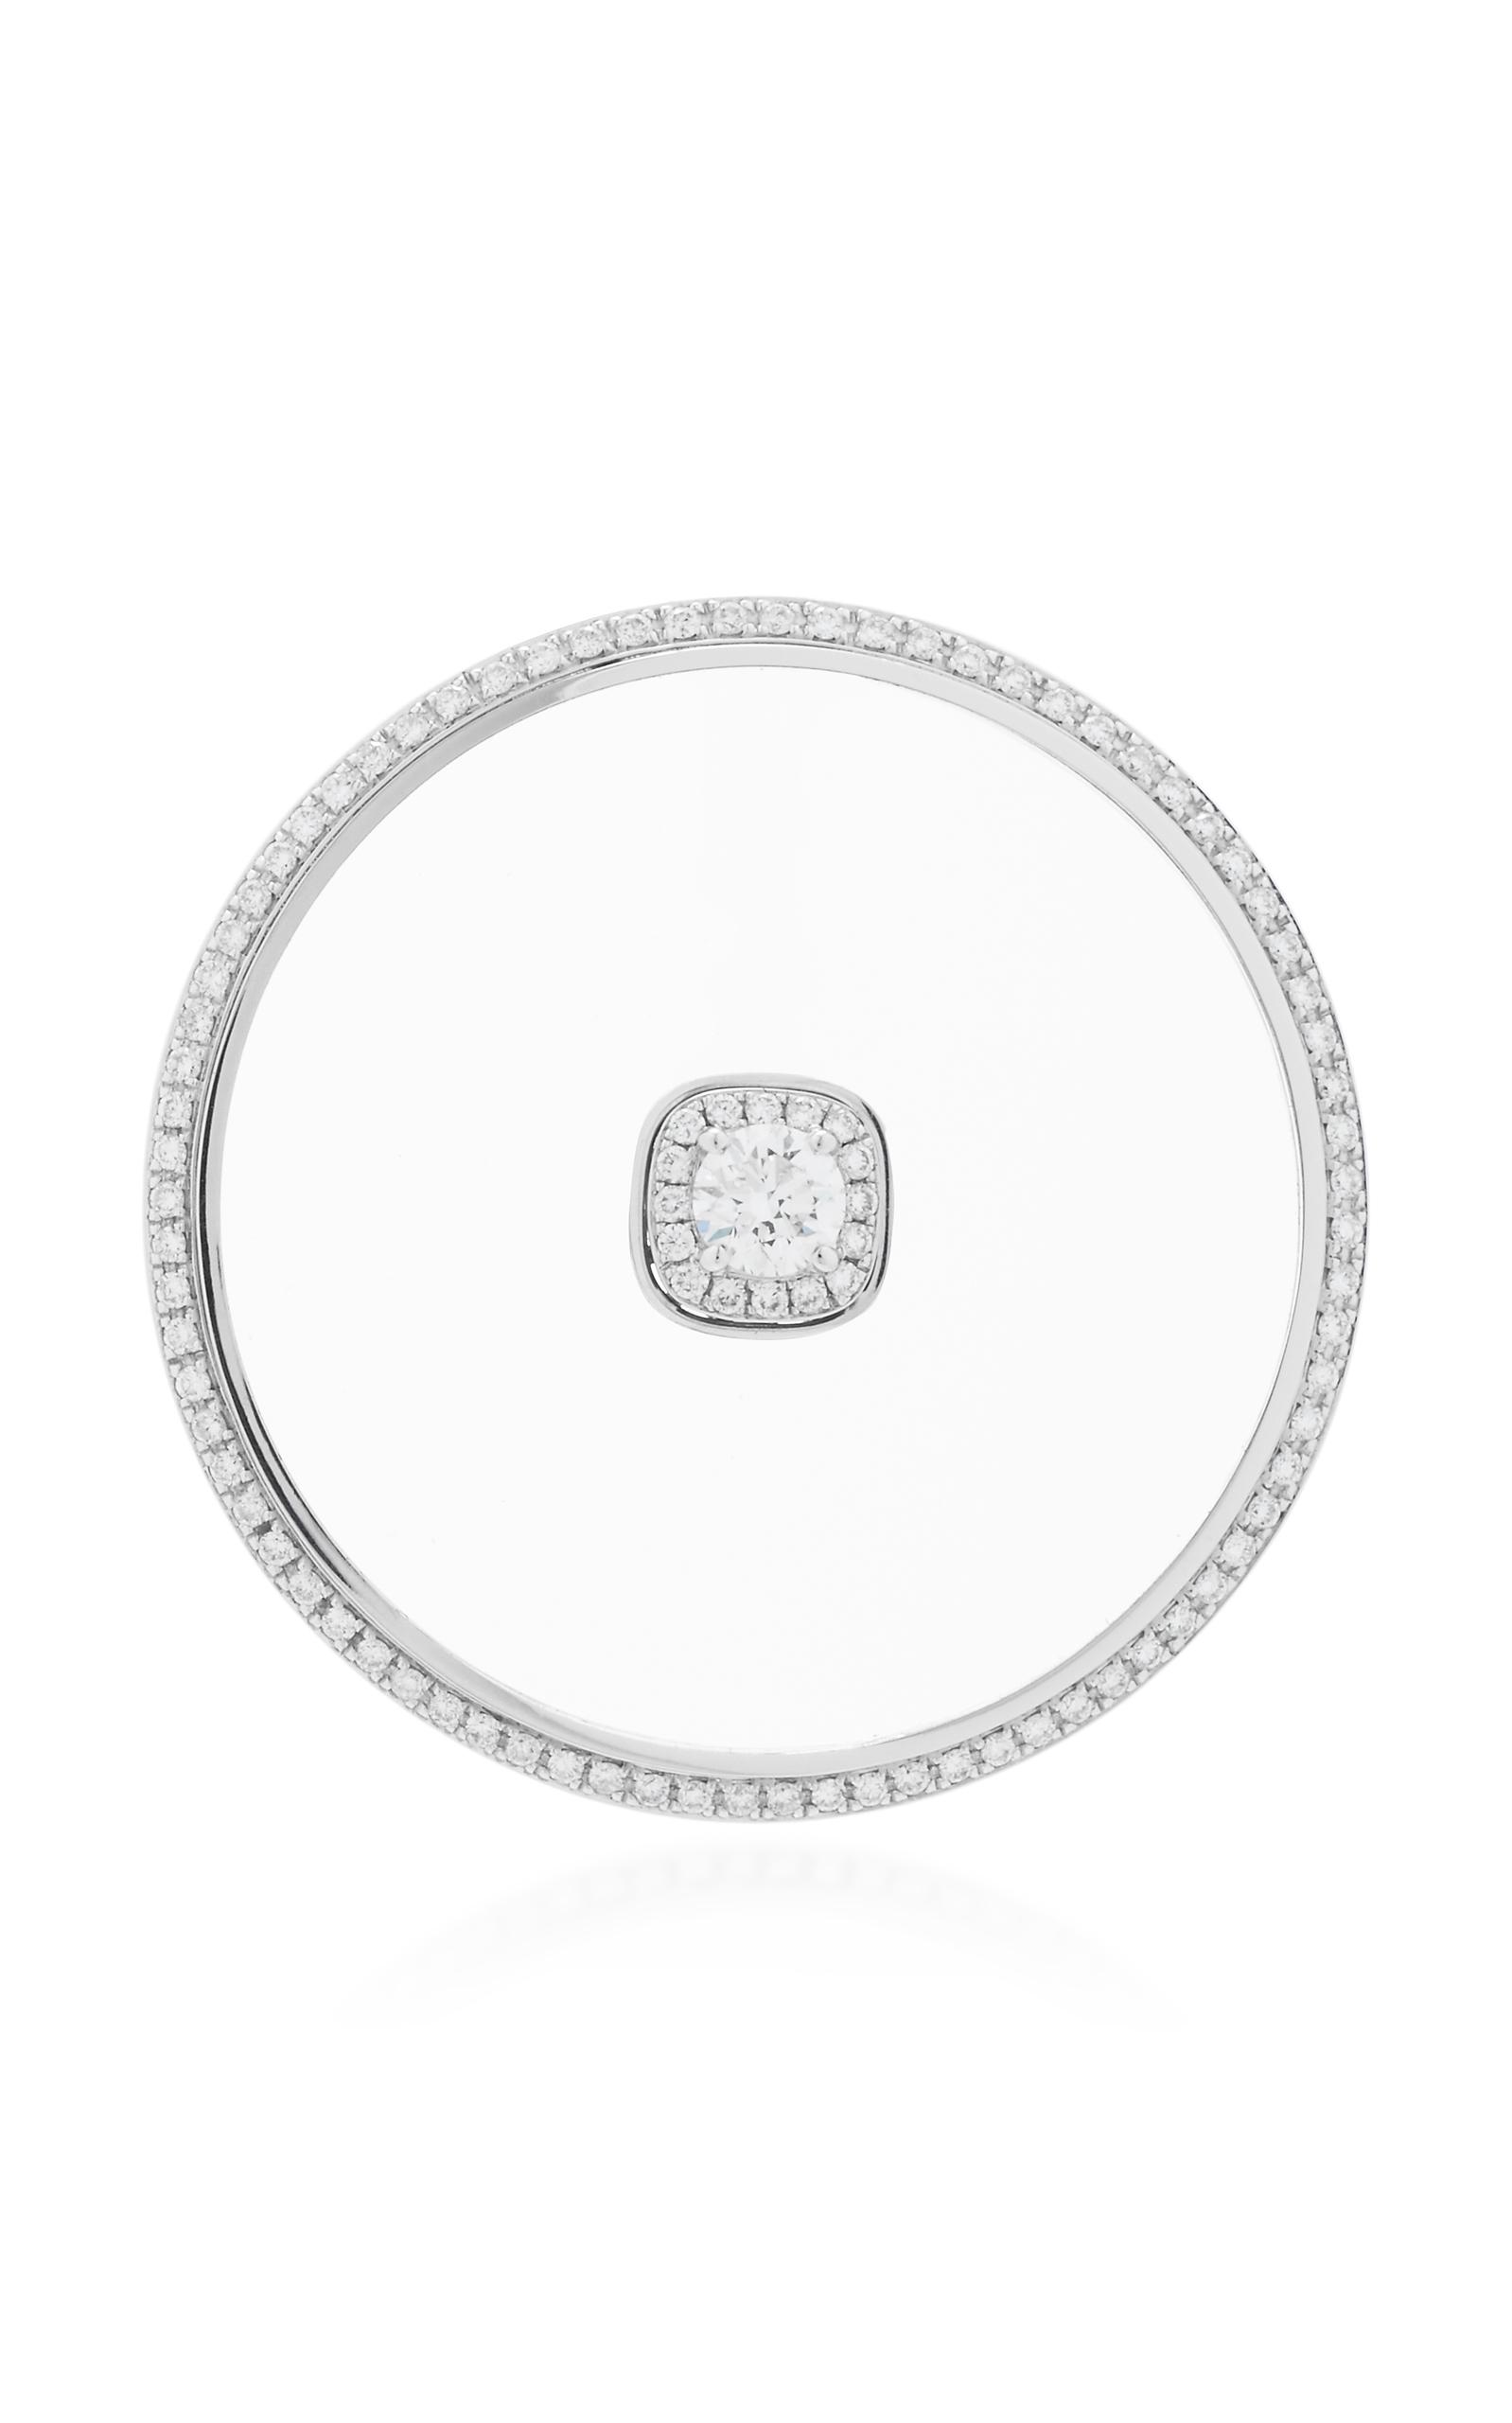 Nikos Koulis – Women's Universe Single Earring with Removable Stud – White – Moda Operandi